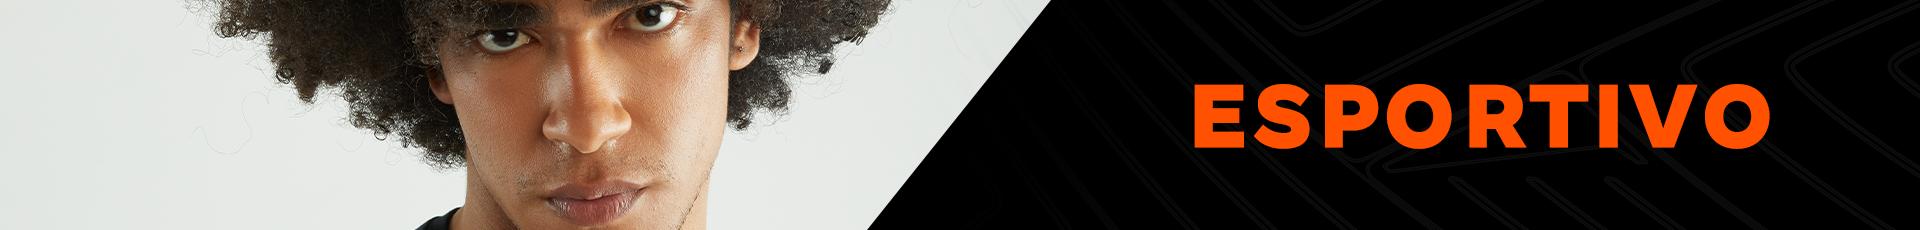 banner-desk-esportivo-uso